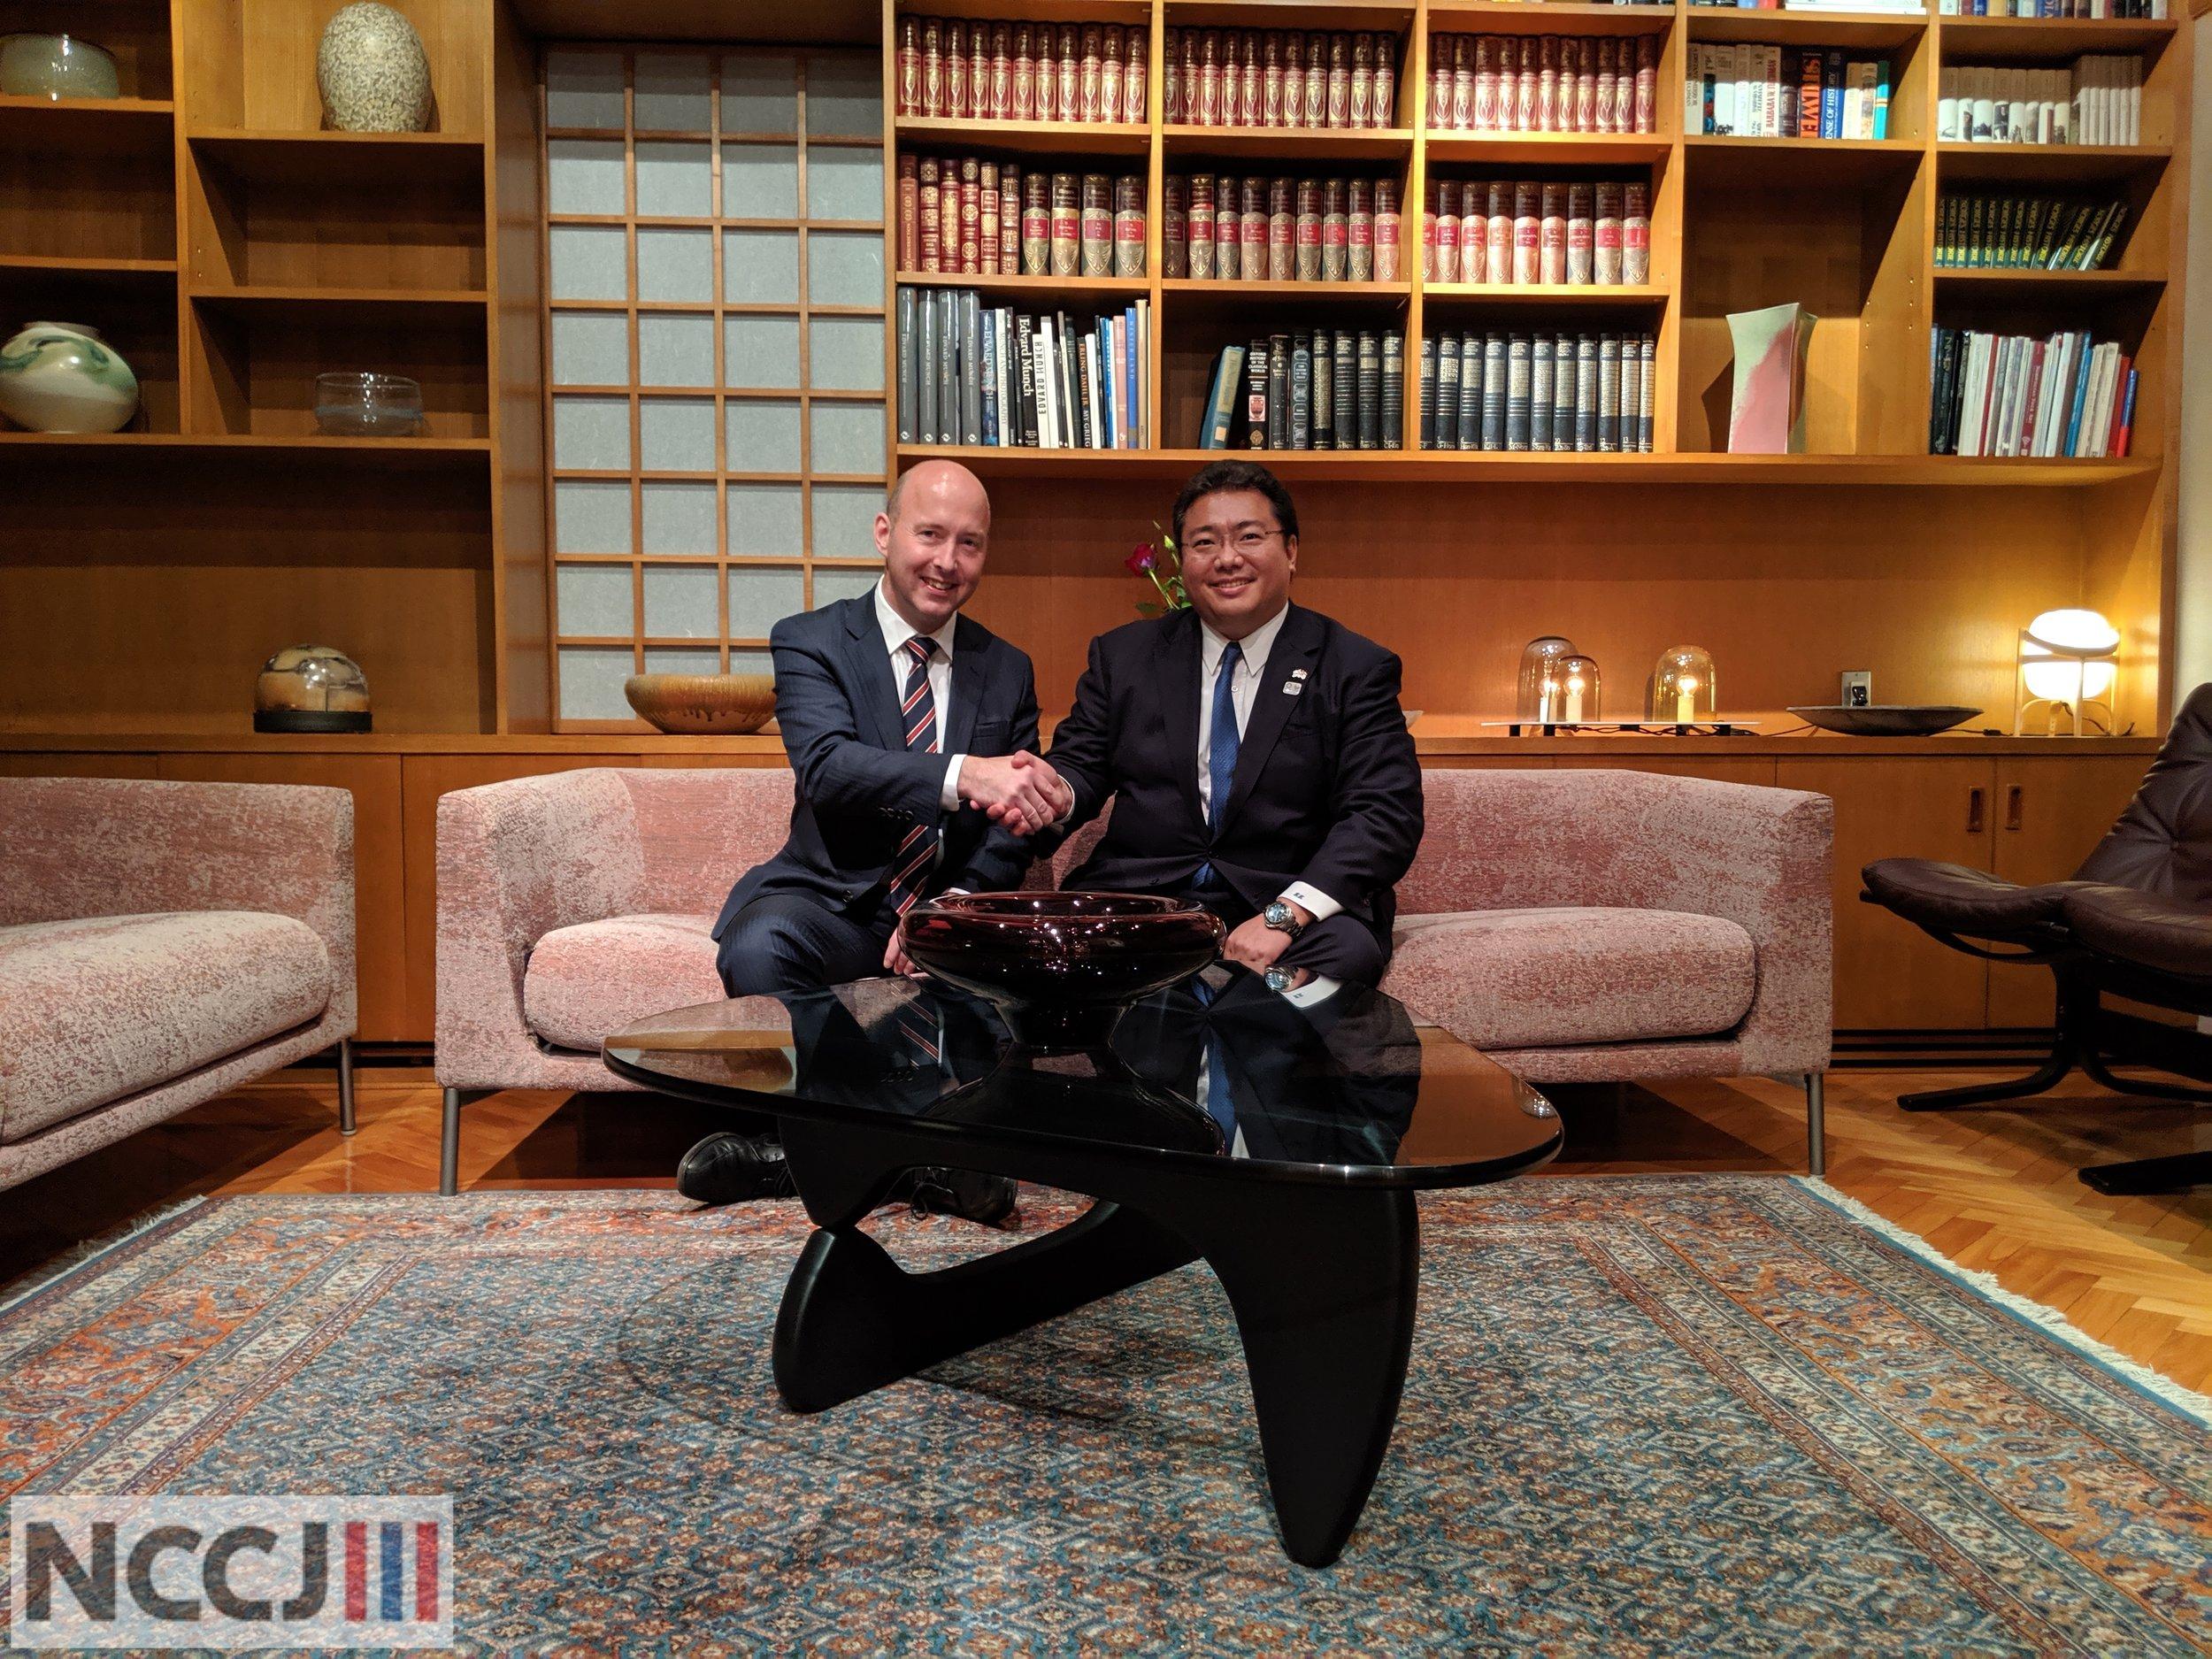 The new NCCJ President, Mr. Svend Haakon Kristensen (President and Representative Director, Laerdal Medical Japan), with former President Mr. Keita Koido (President of Lerøy Japan)